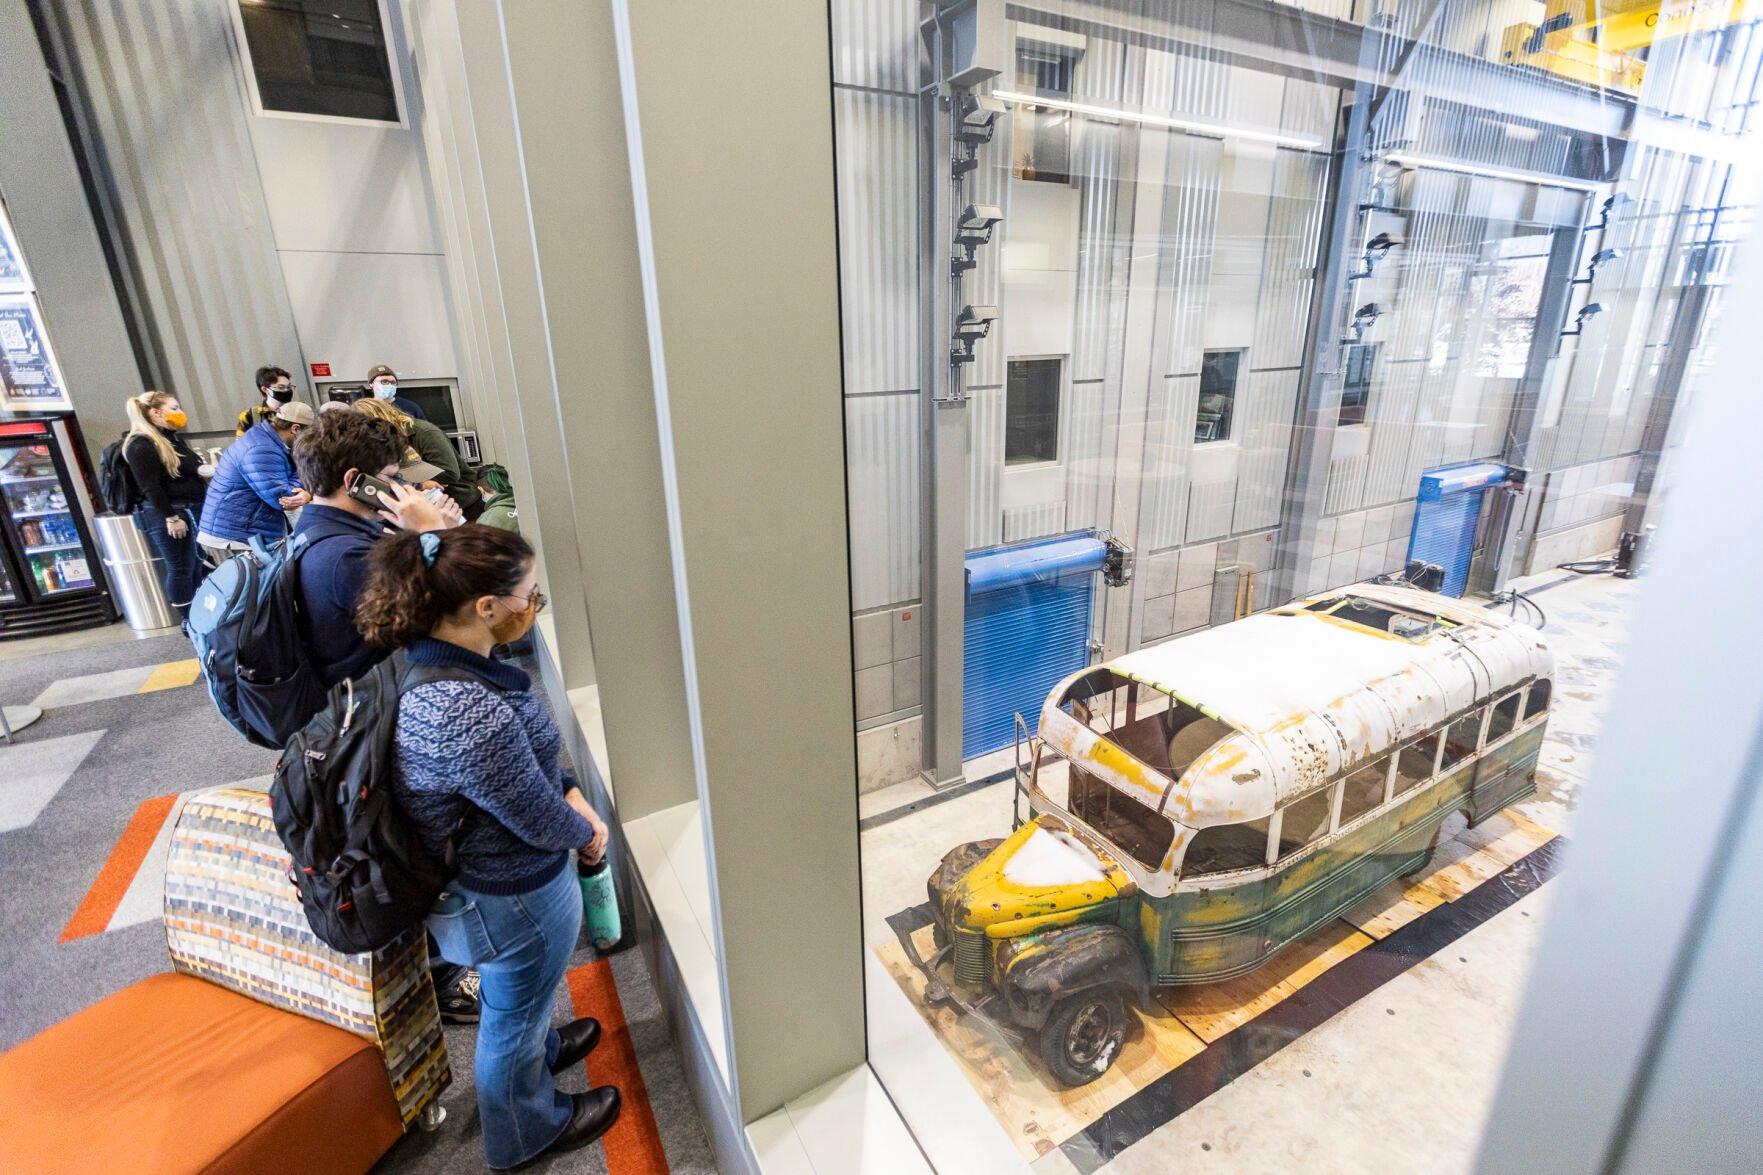 'Into the Wild' bus